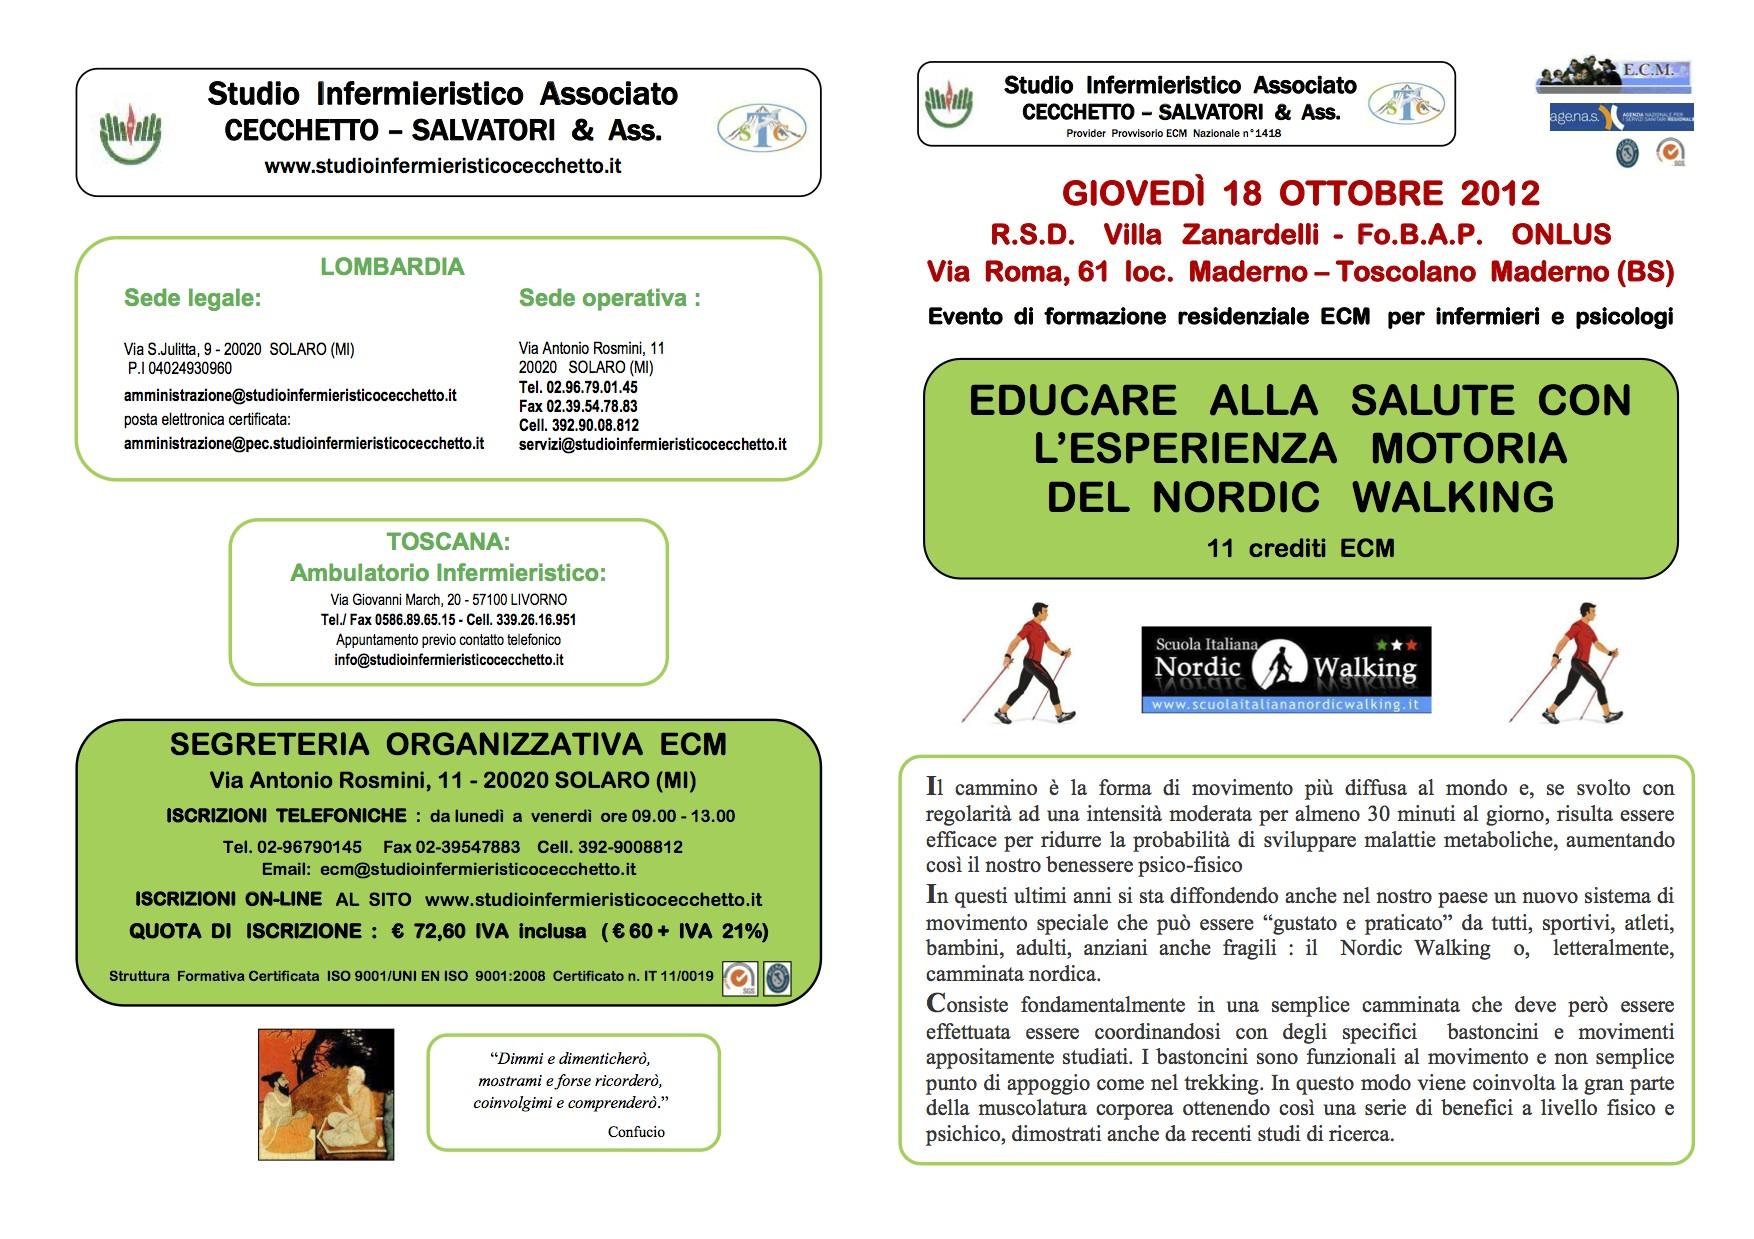 http://www.nordicwalkingtaoverona.it/wp-content/uploads/2012/10/Formazione18Ottobre1.jpg